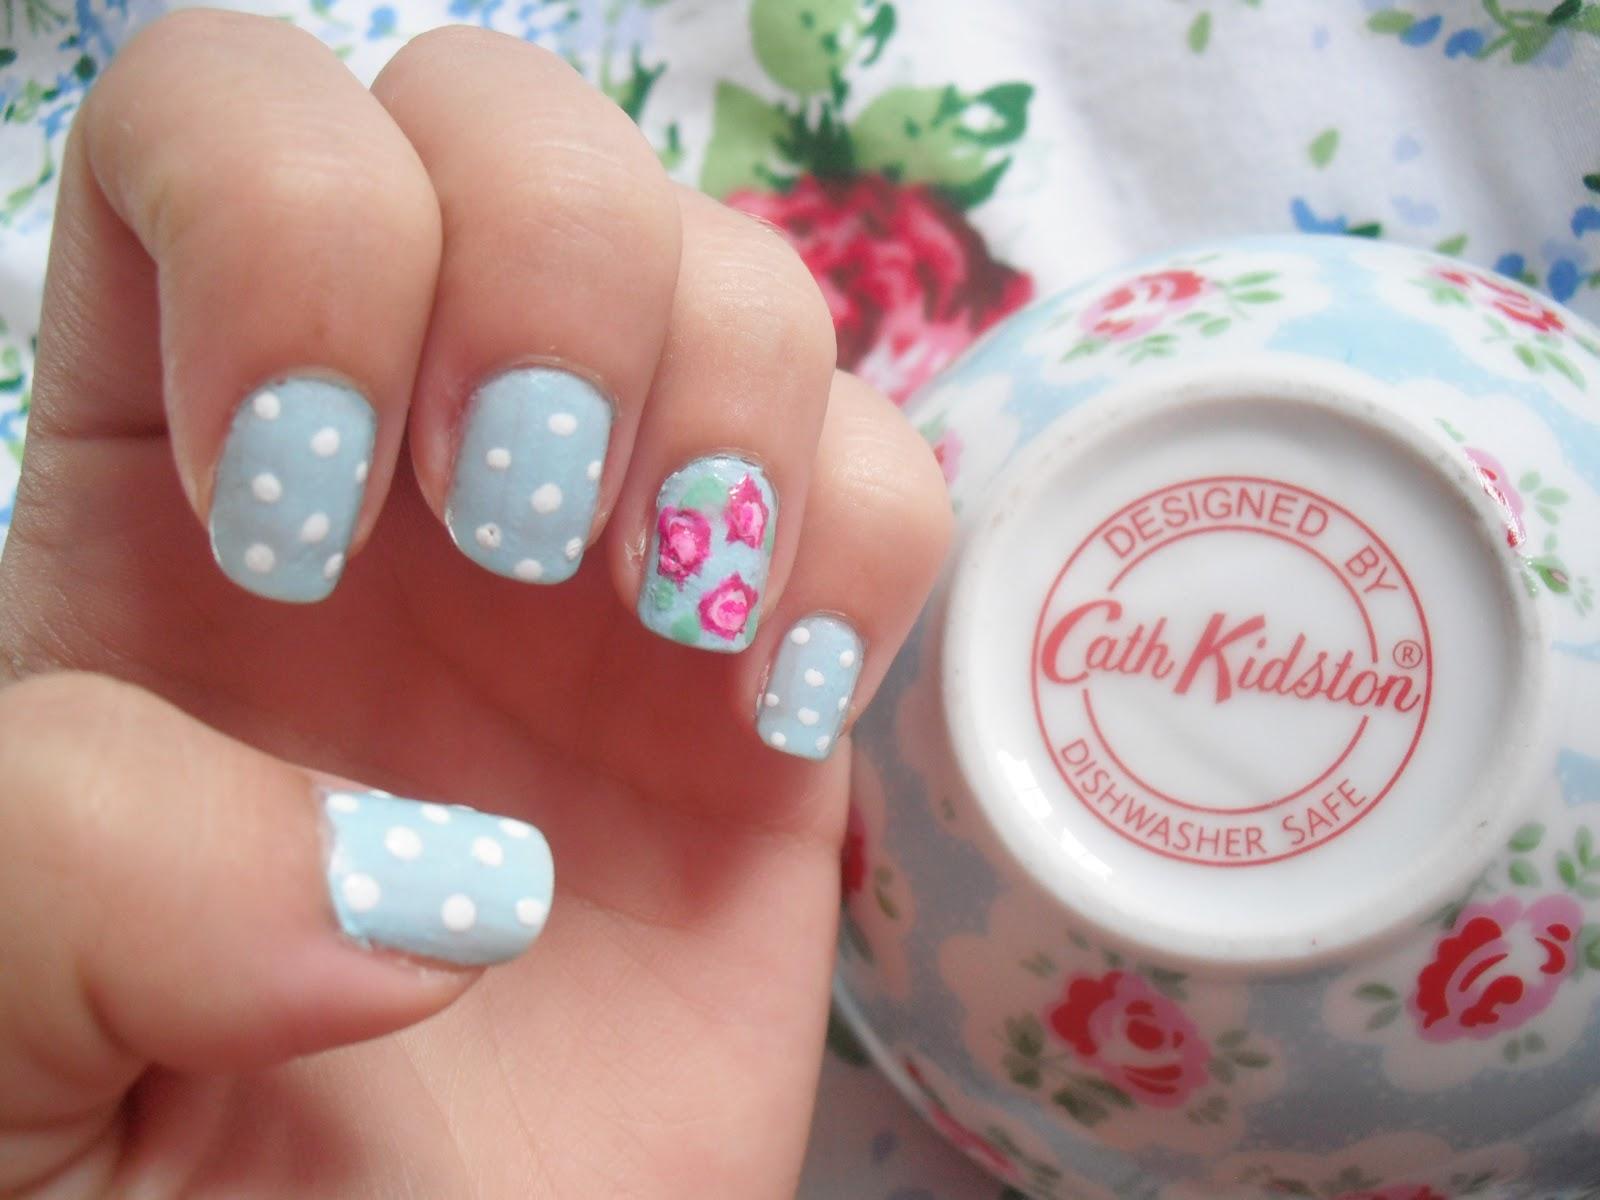 Cath Kidston Nails Floral Nail Art Victorias Vintage Blog